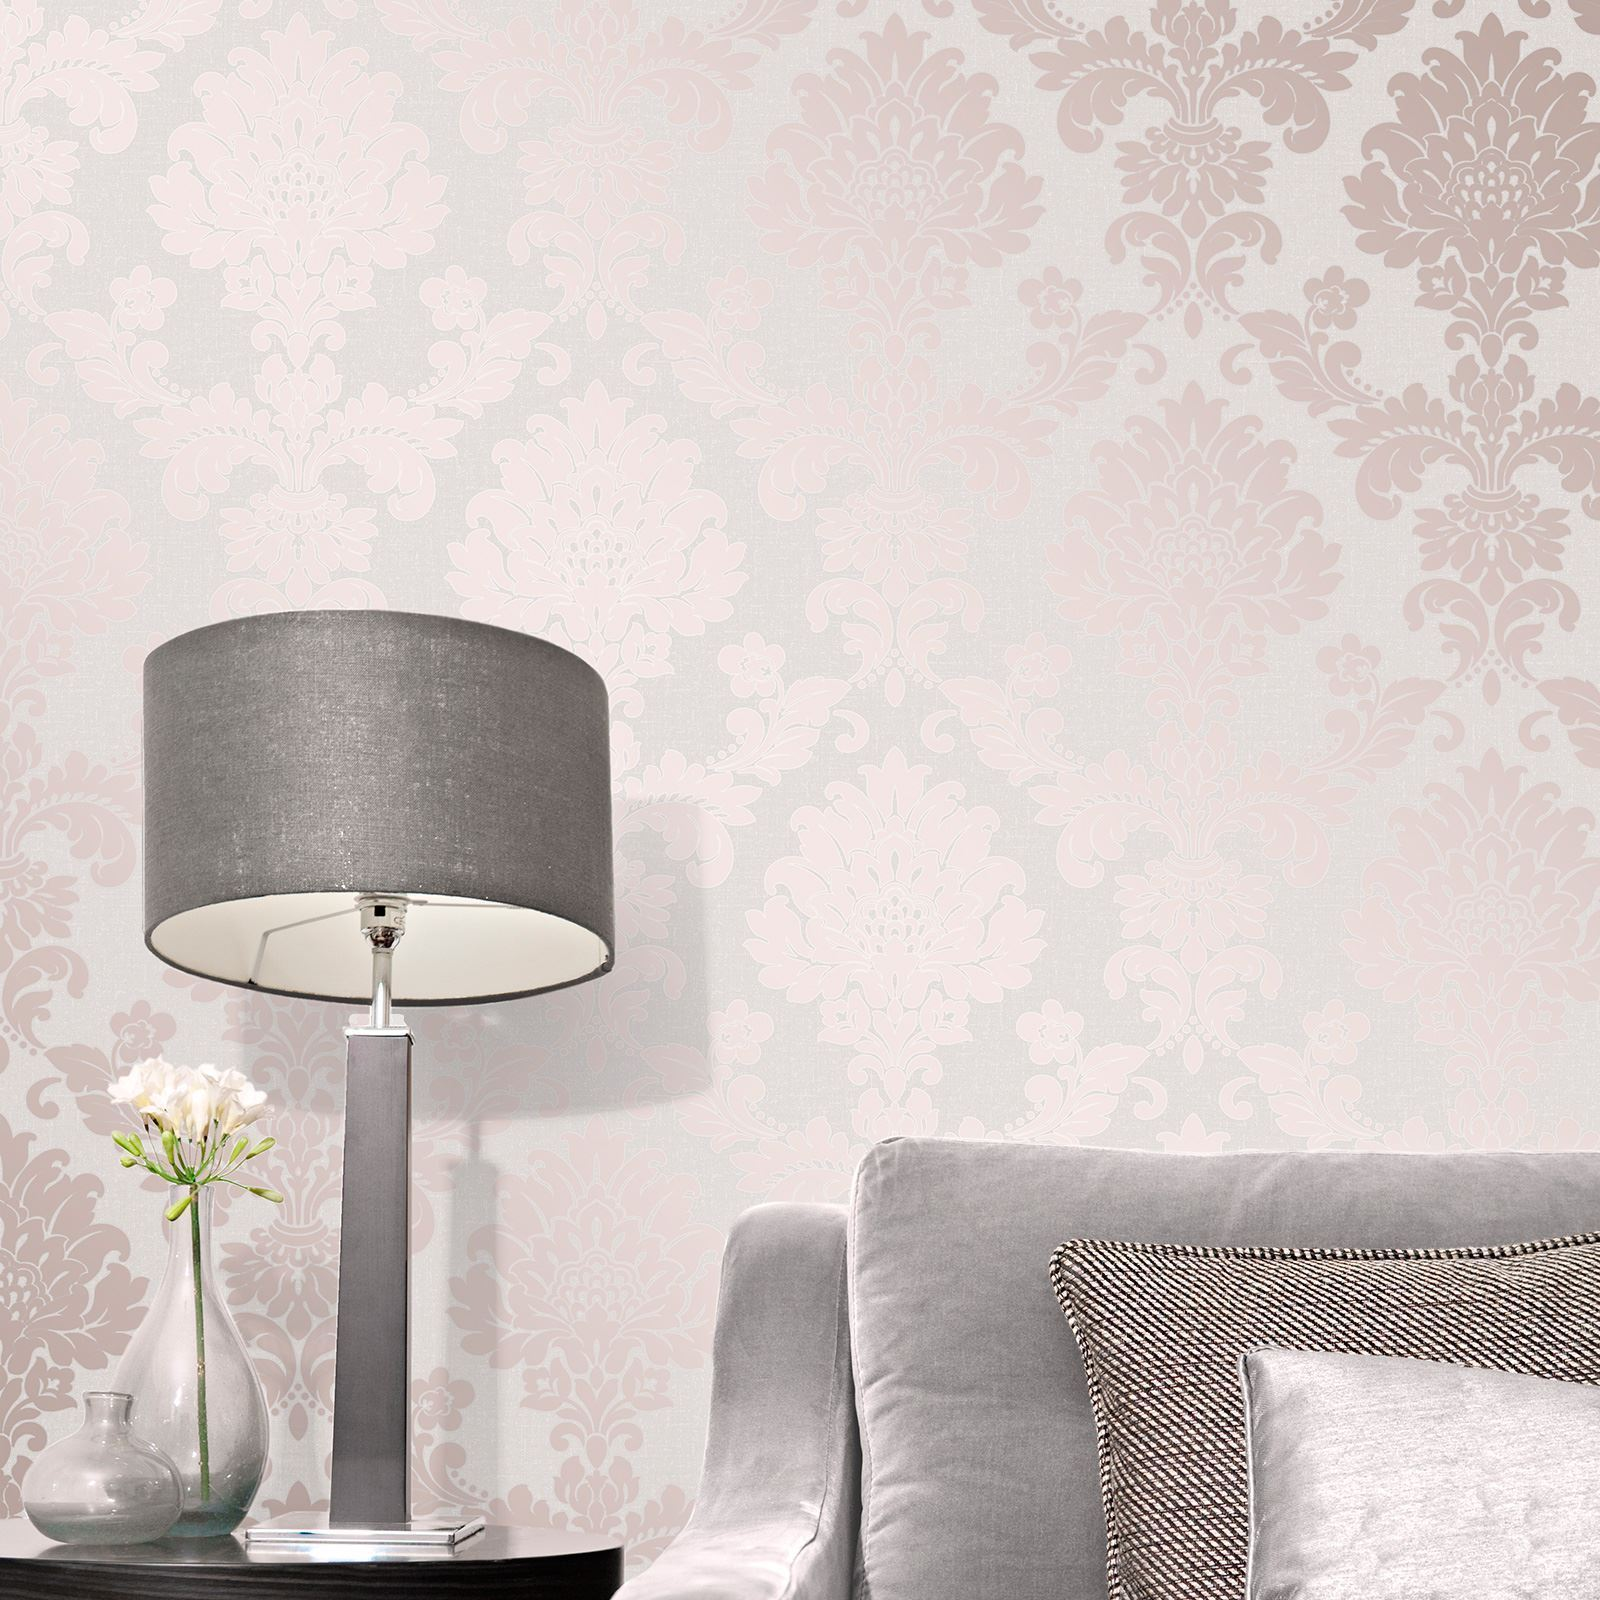 Rose gold wallpaper various designs luxury glitter effect metallic modern shiny ebay - Glitter wallpaper ideas ...